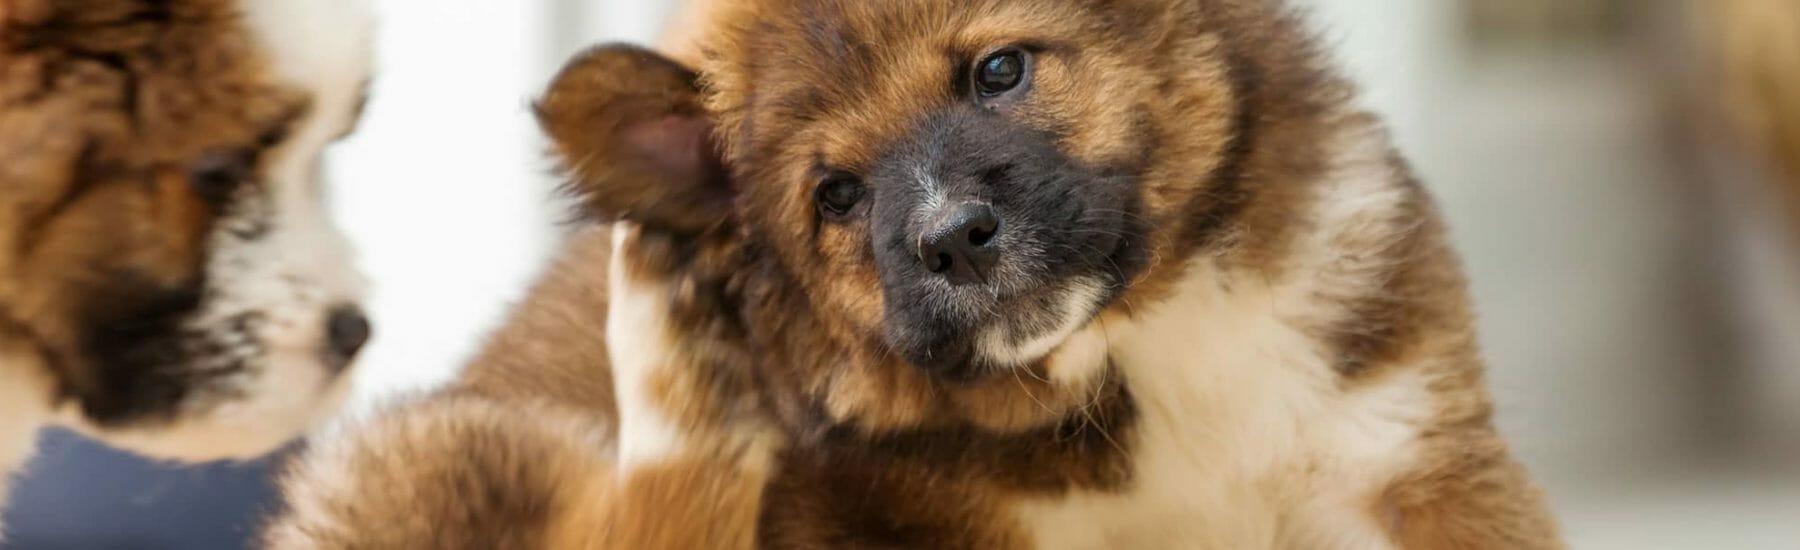 Brown dog scratching ear